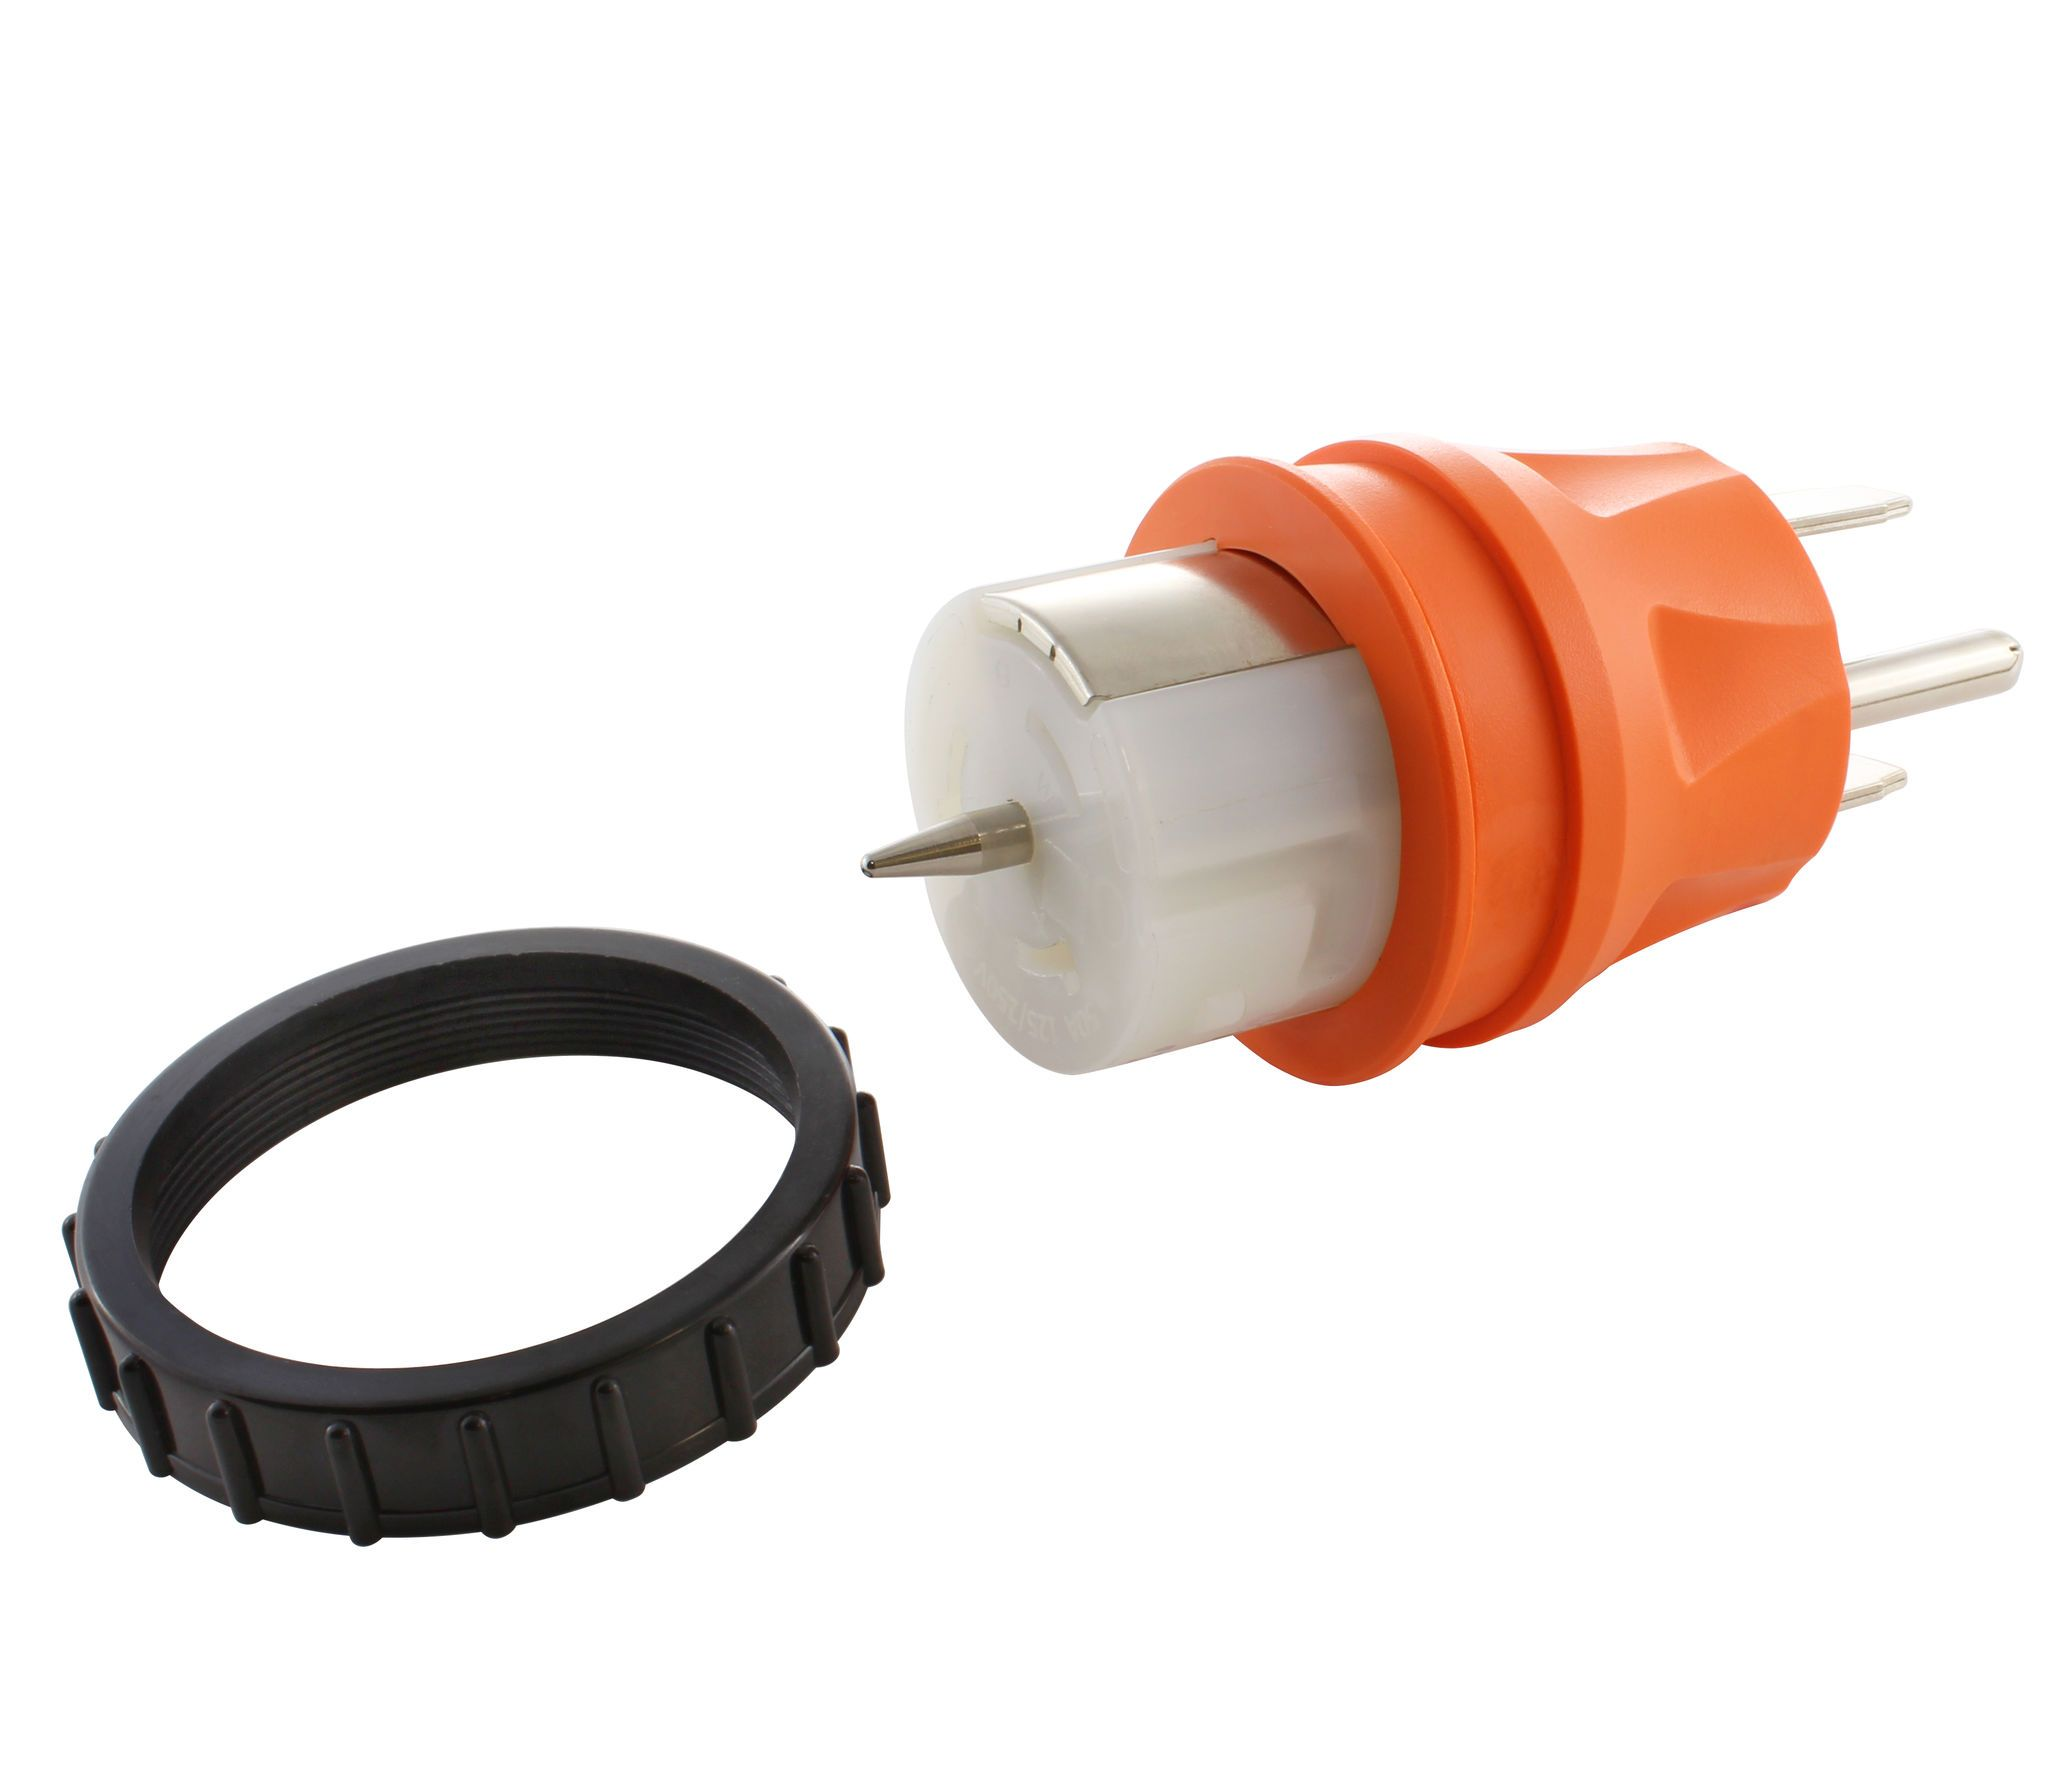 50ft 50 Amp Transfer Switch Power Cord NEMA 14-50P to CS6364 by AC WORKS®